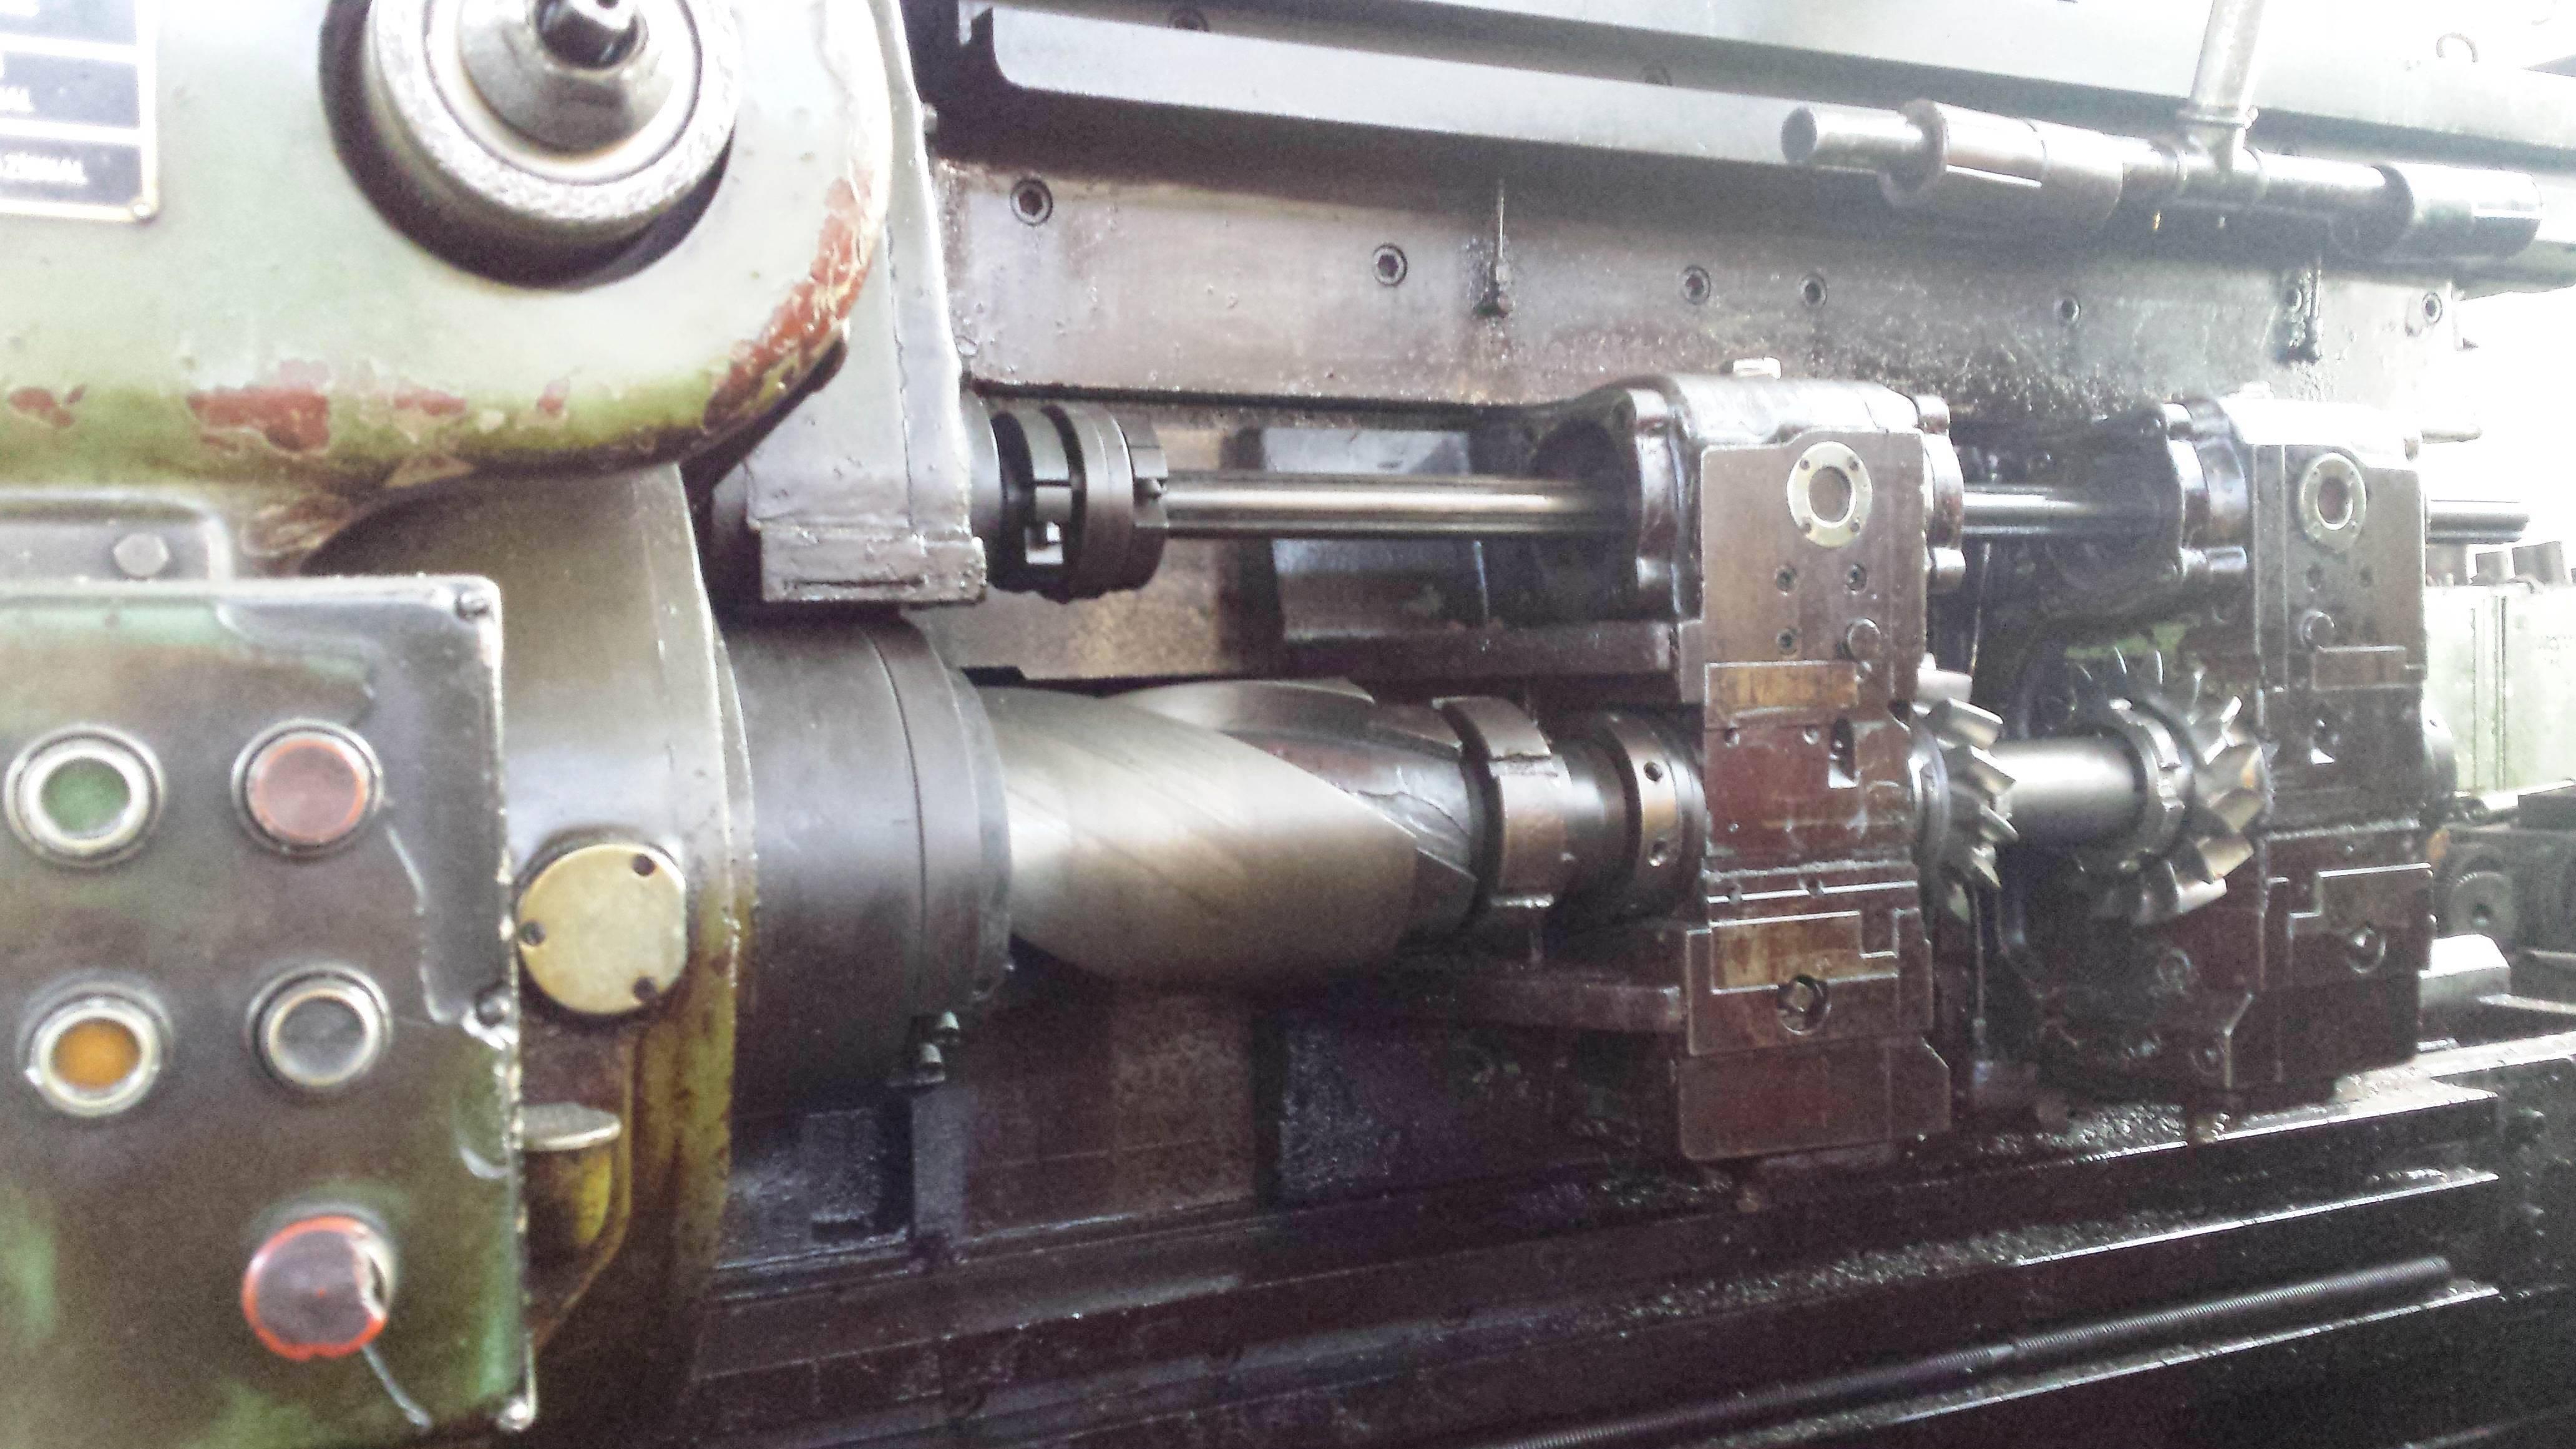 5E Generator sykes 5e gear generator - exapro